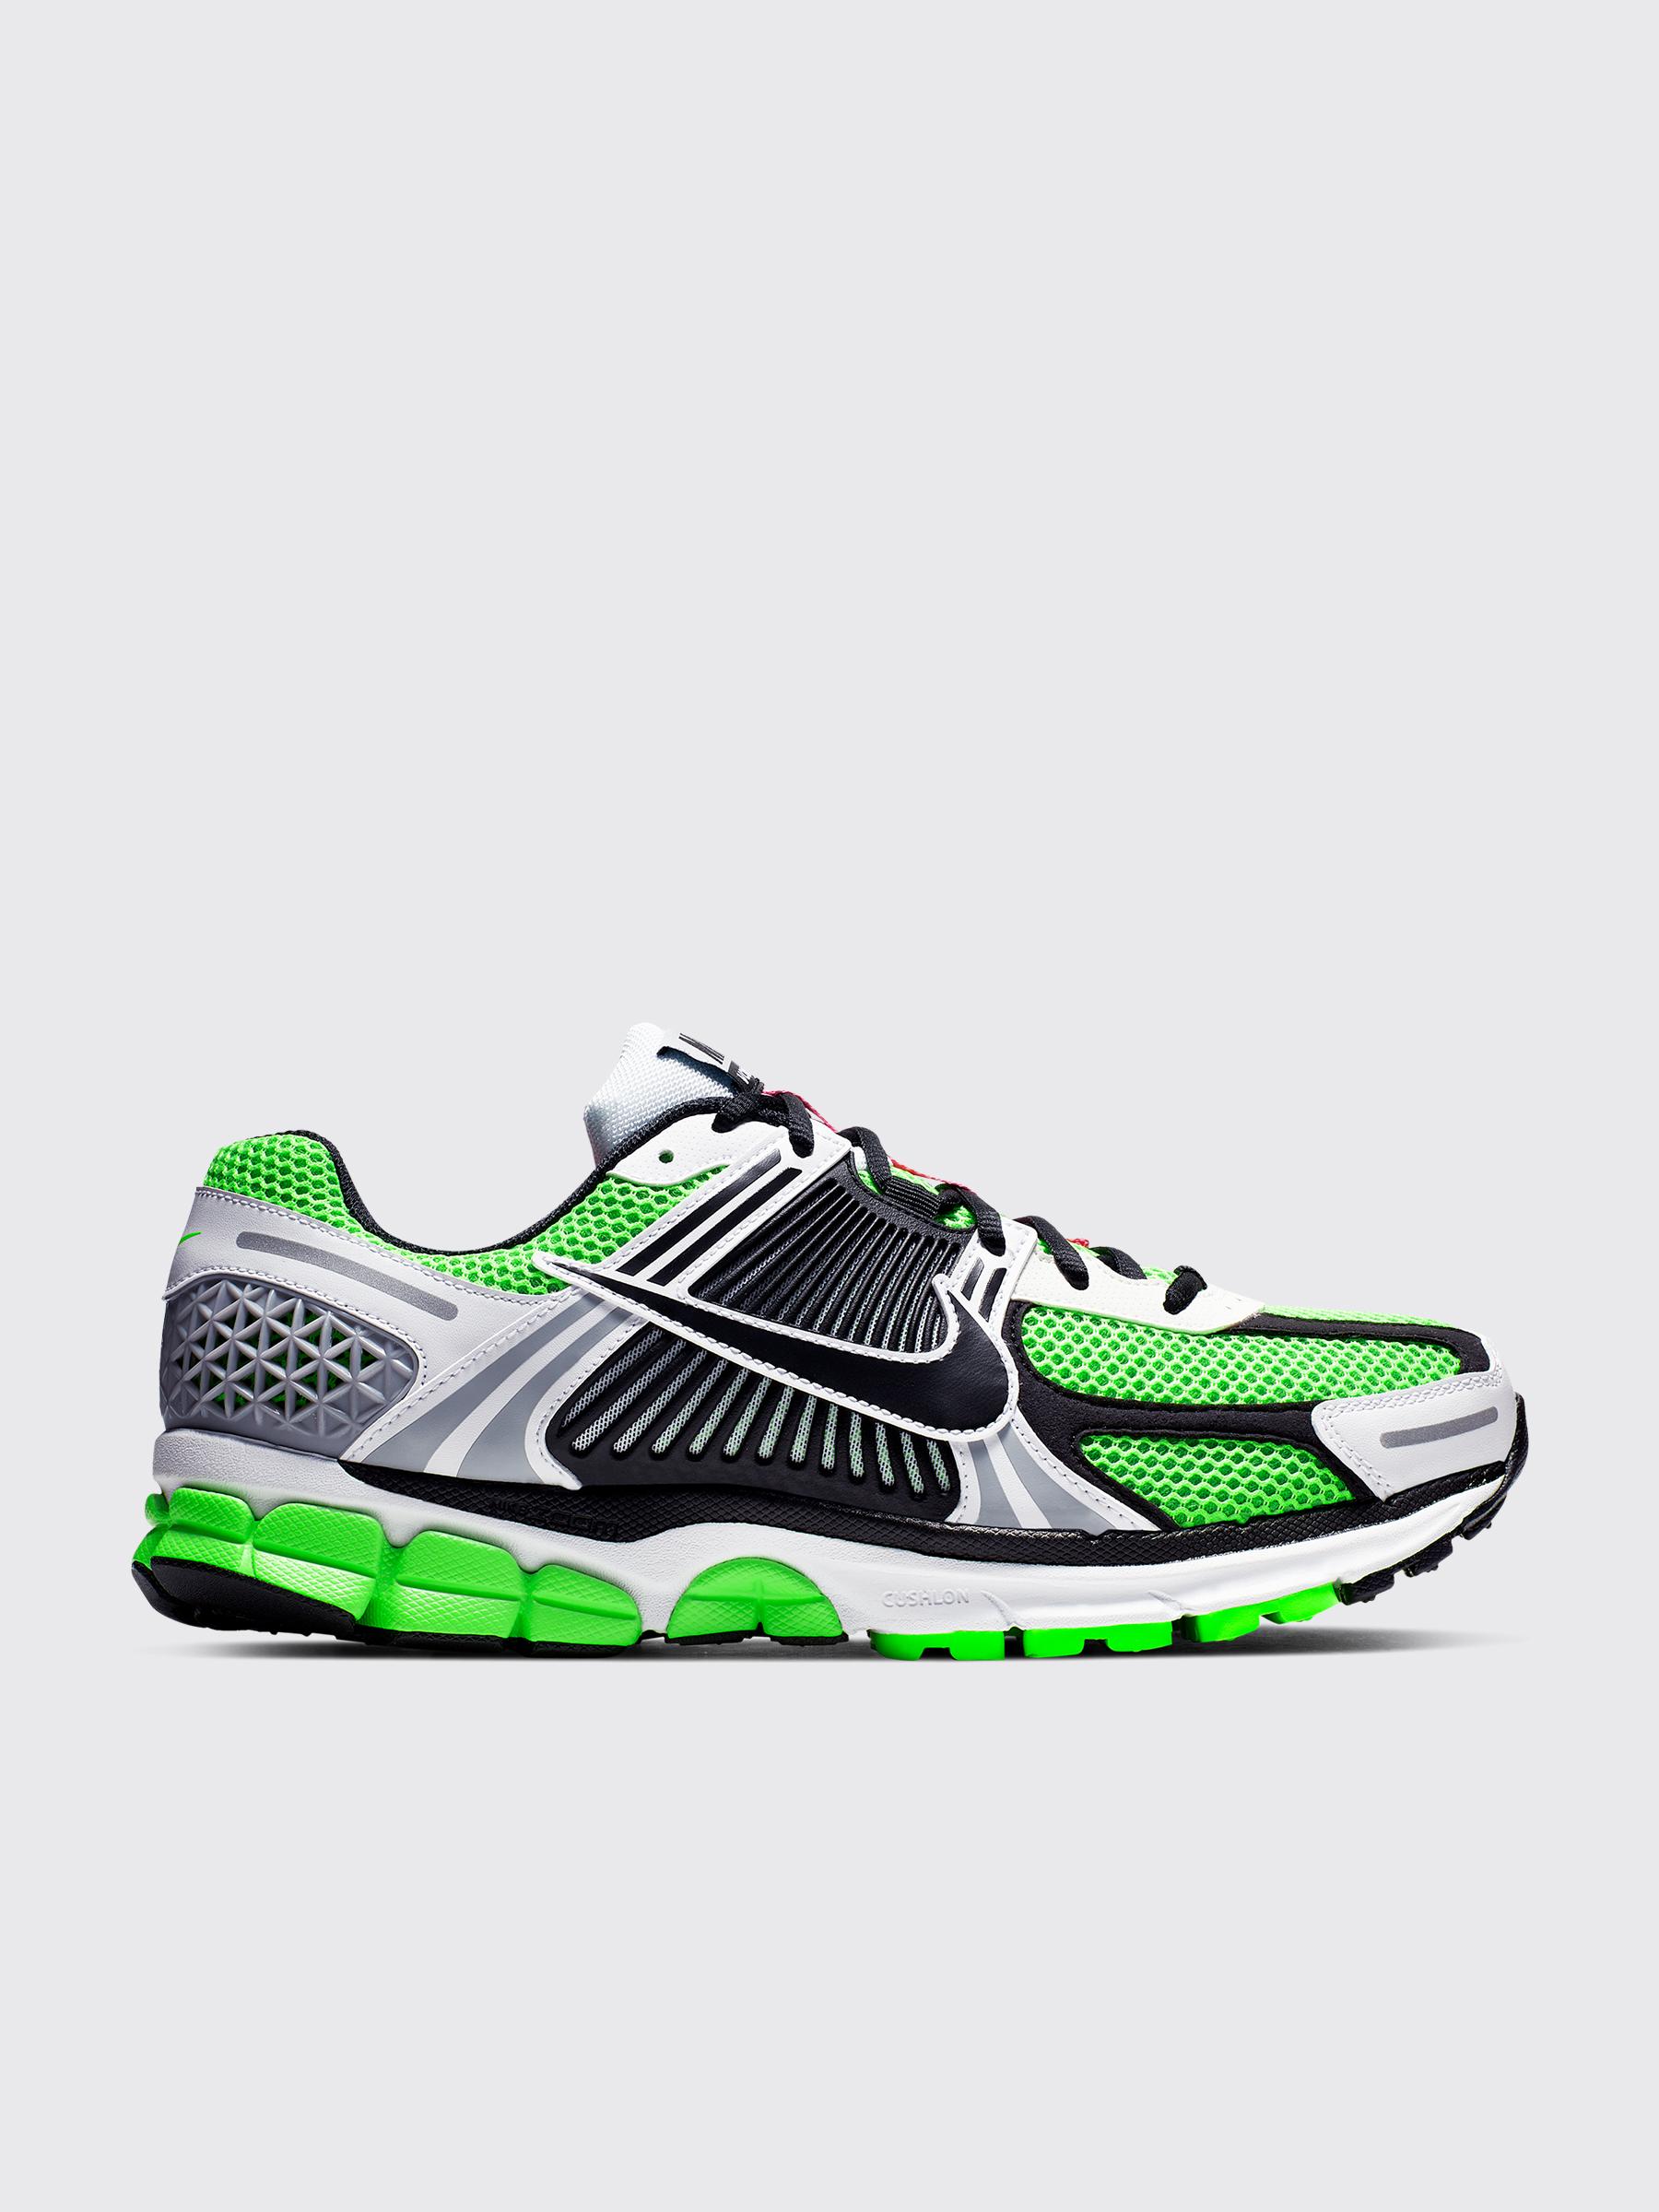 best sneakers f40ca f1db8 Très Bien - Nike Zoom Vomero 5 SE SP Electric Green